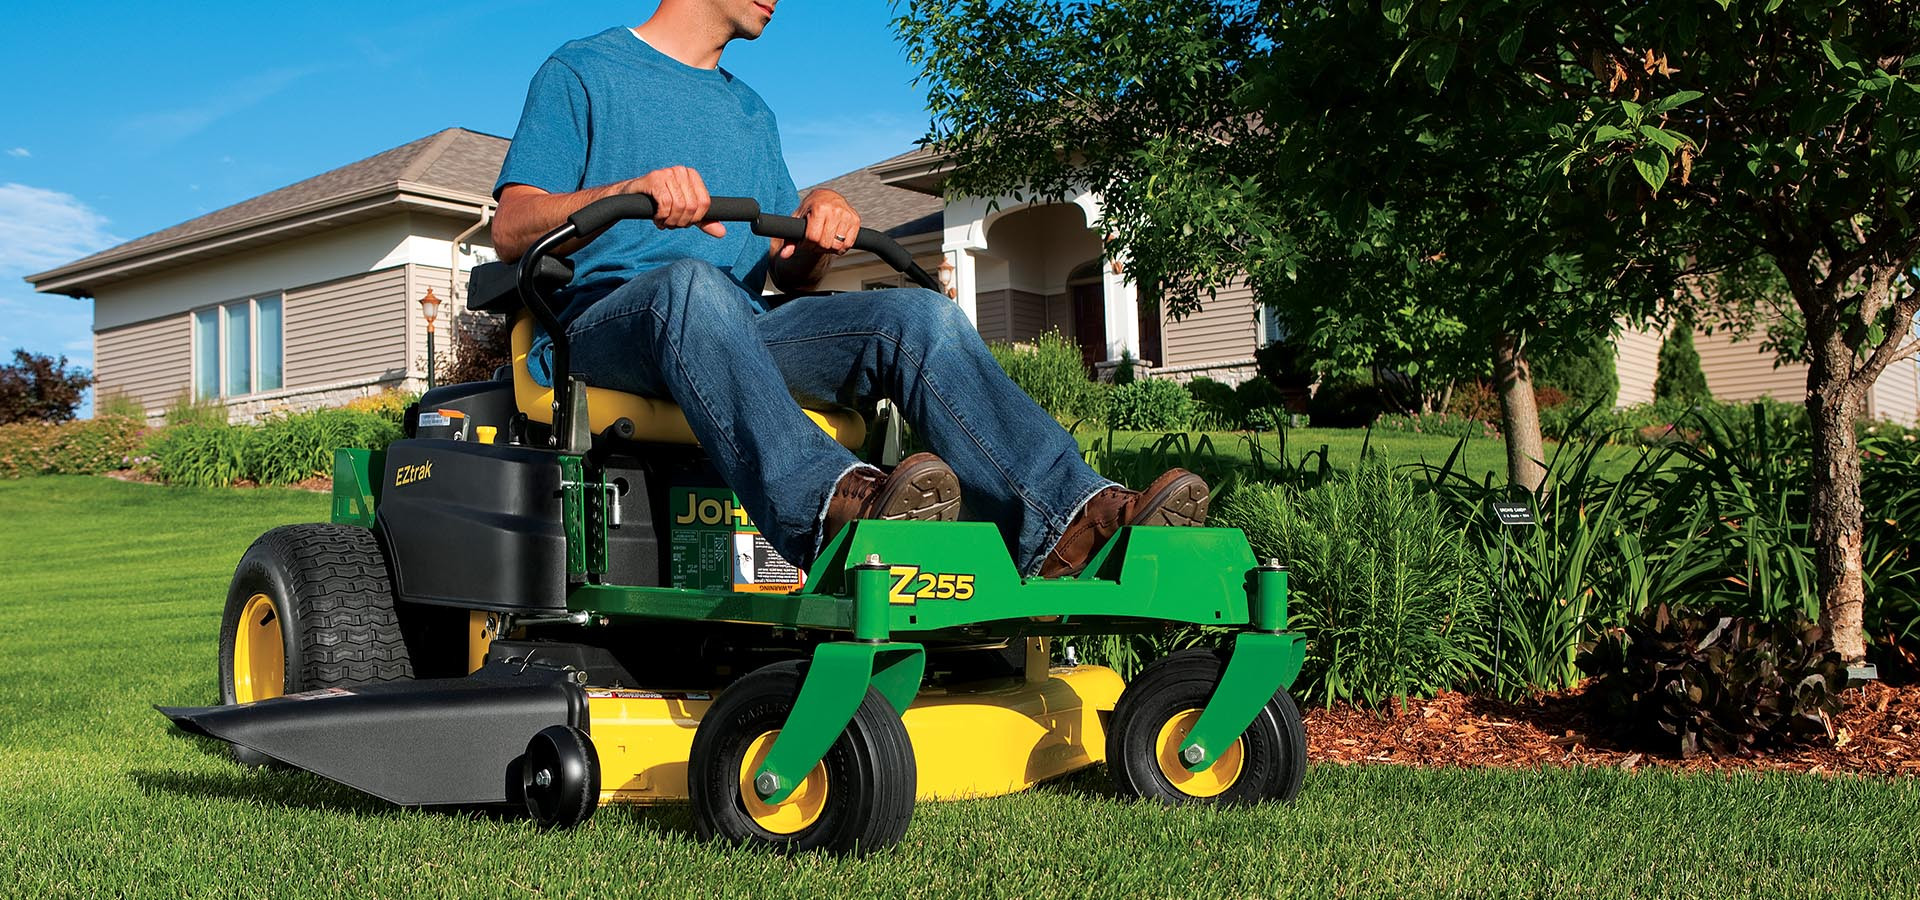 Best ideas about John Deere Landscape Supplies . Save or Pin John Deere Zero Turn Lawn Mowers Now.